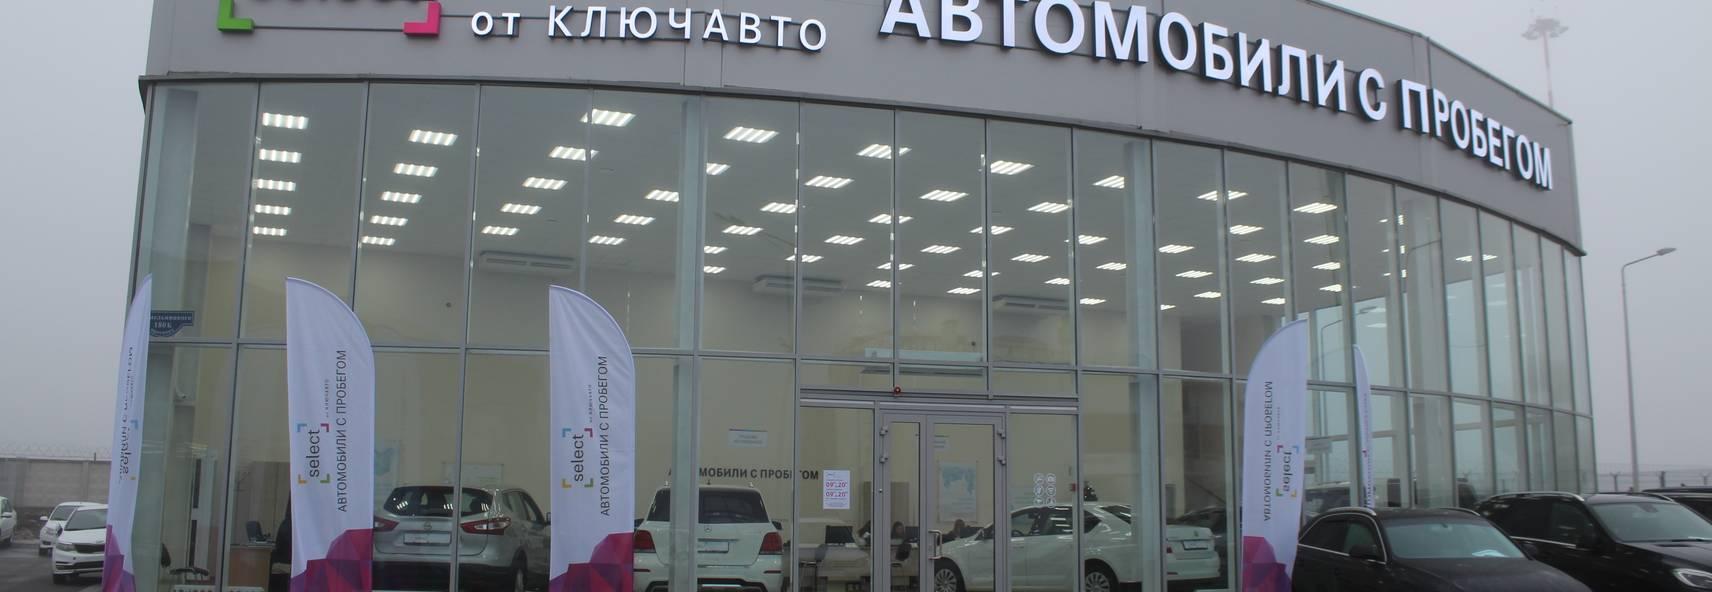 SELECT от КЛЮЧАВТО Белгород